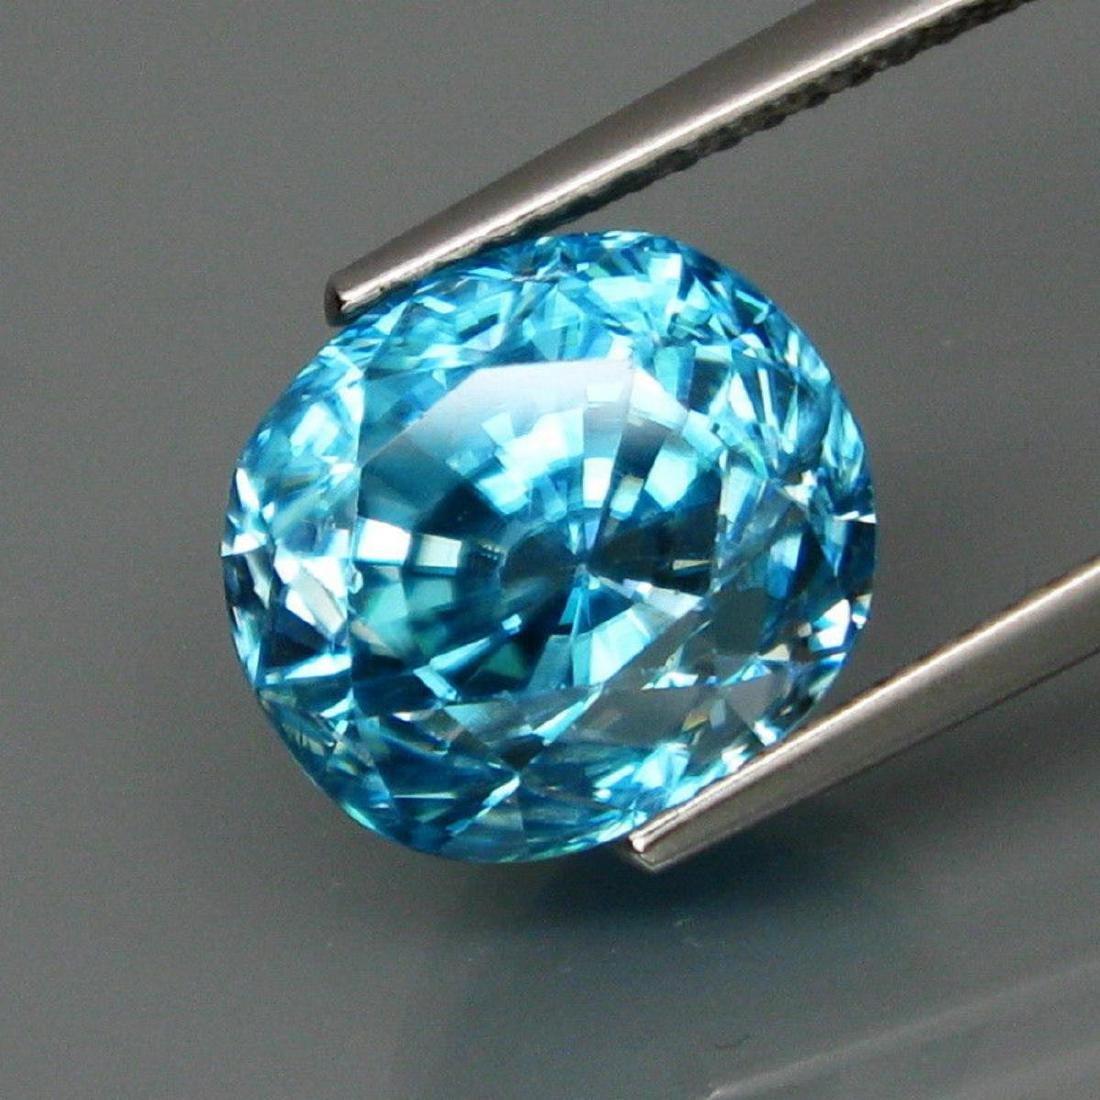 Natural Blue Cambodian Zircon 10.66 Ct